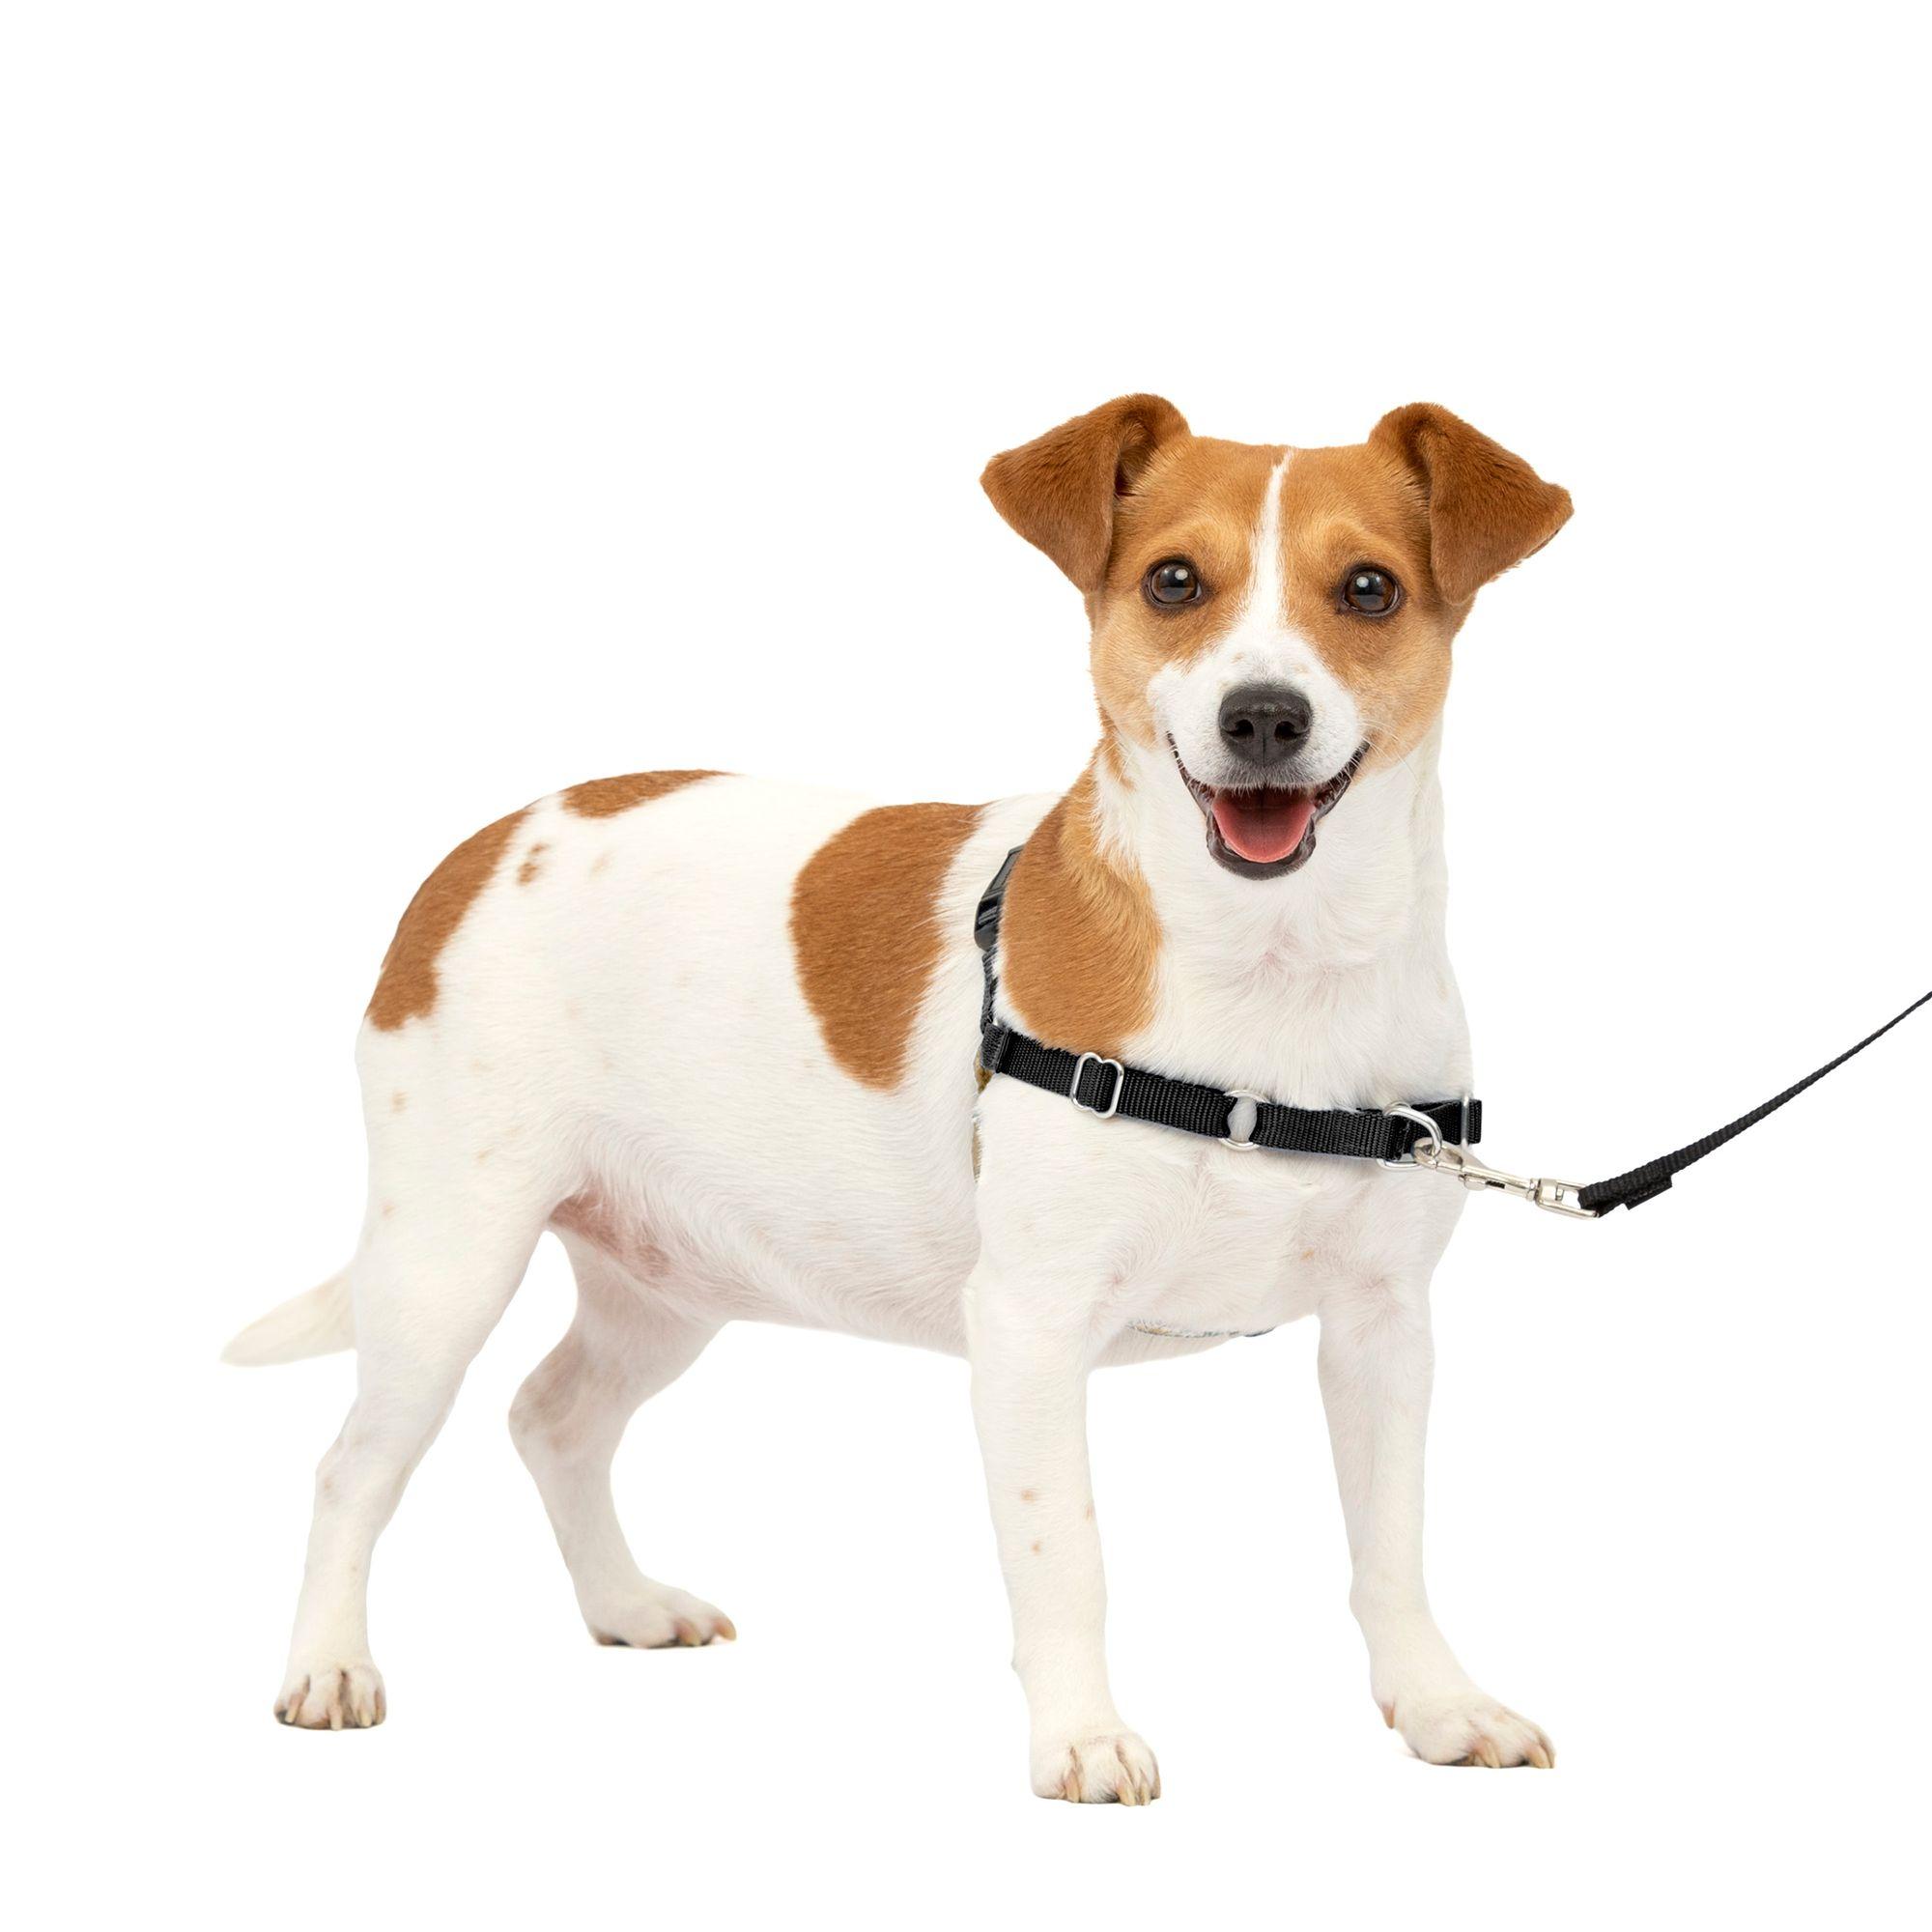 PetSafe Easy Walk Dog Harness size: Small, Black